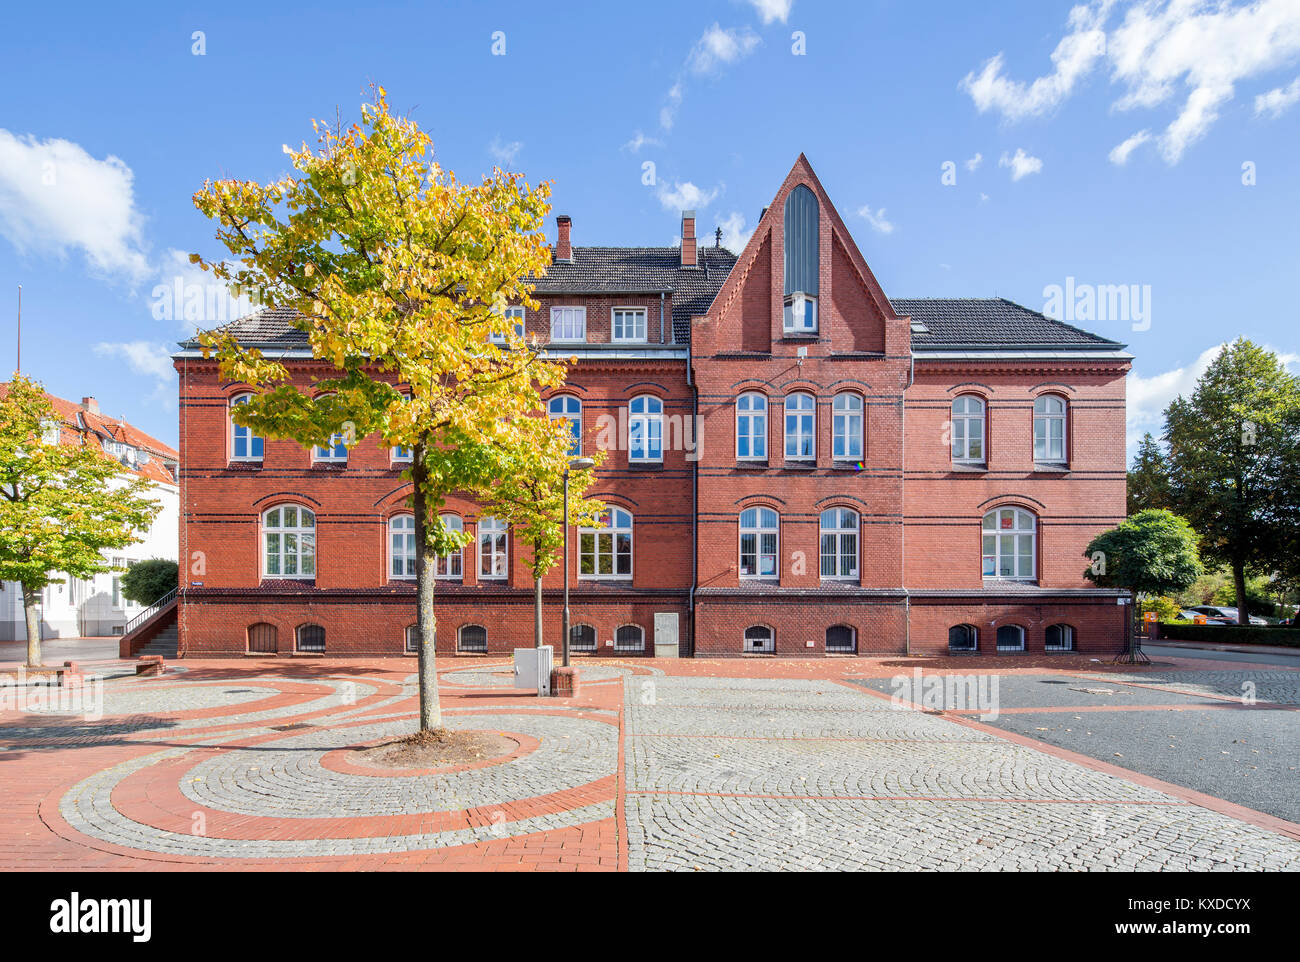 Old Post Office,Brick Building,Brake,Lower Saxony,Germany - Stock Image